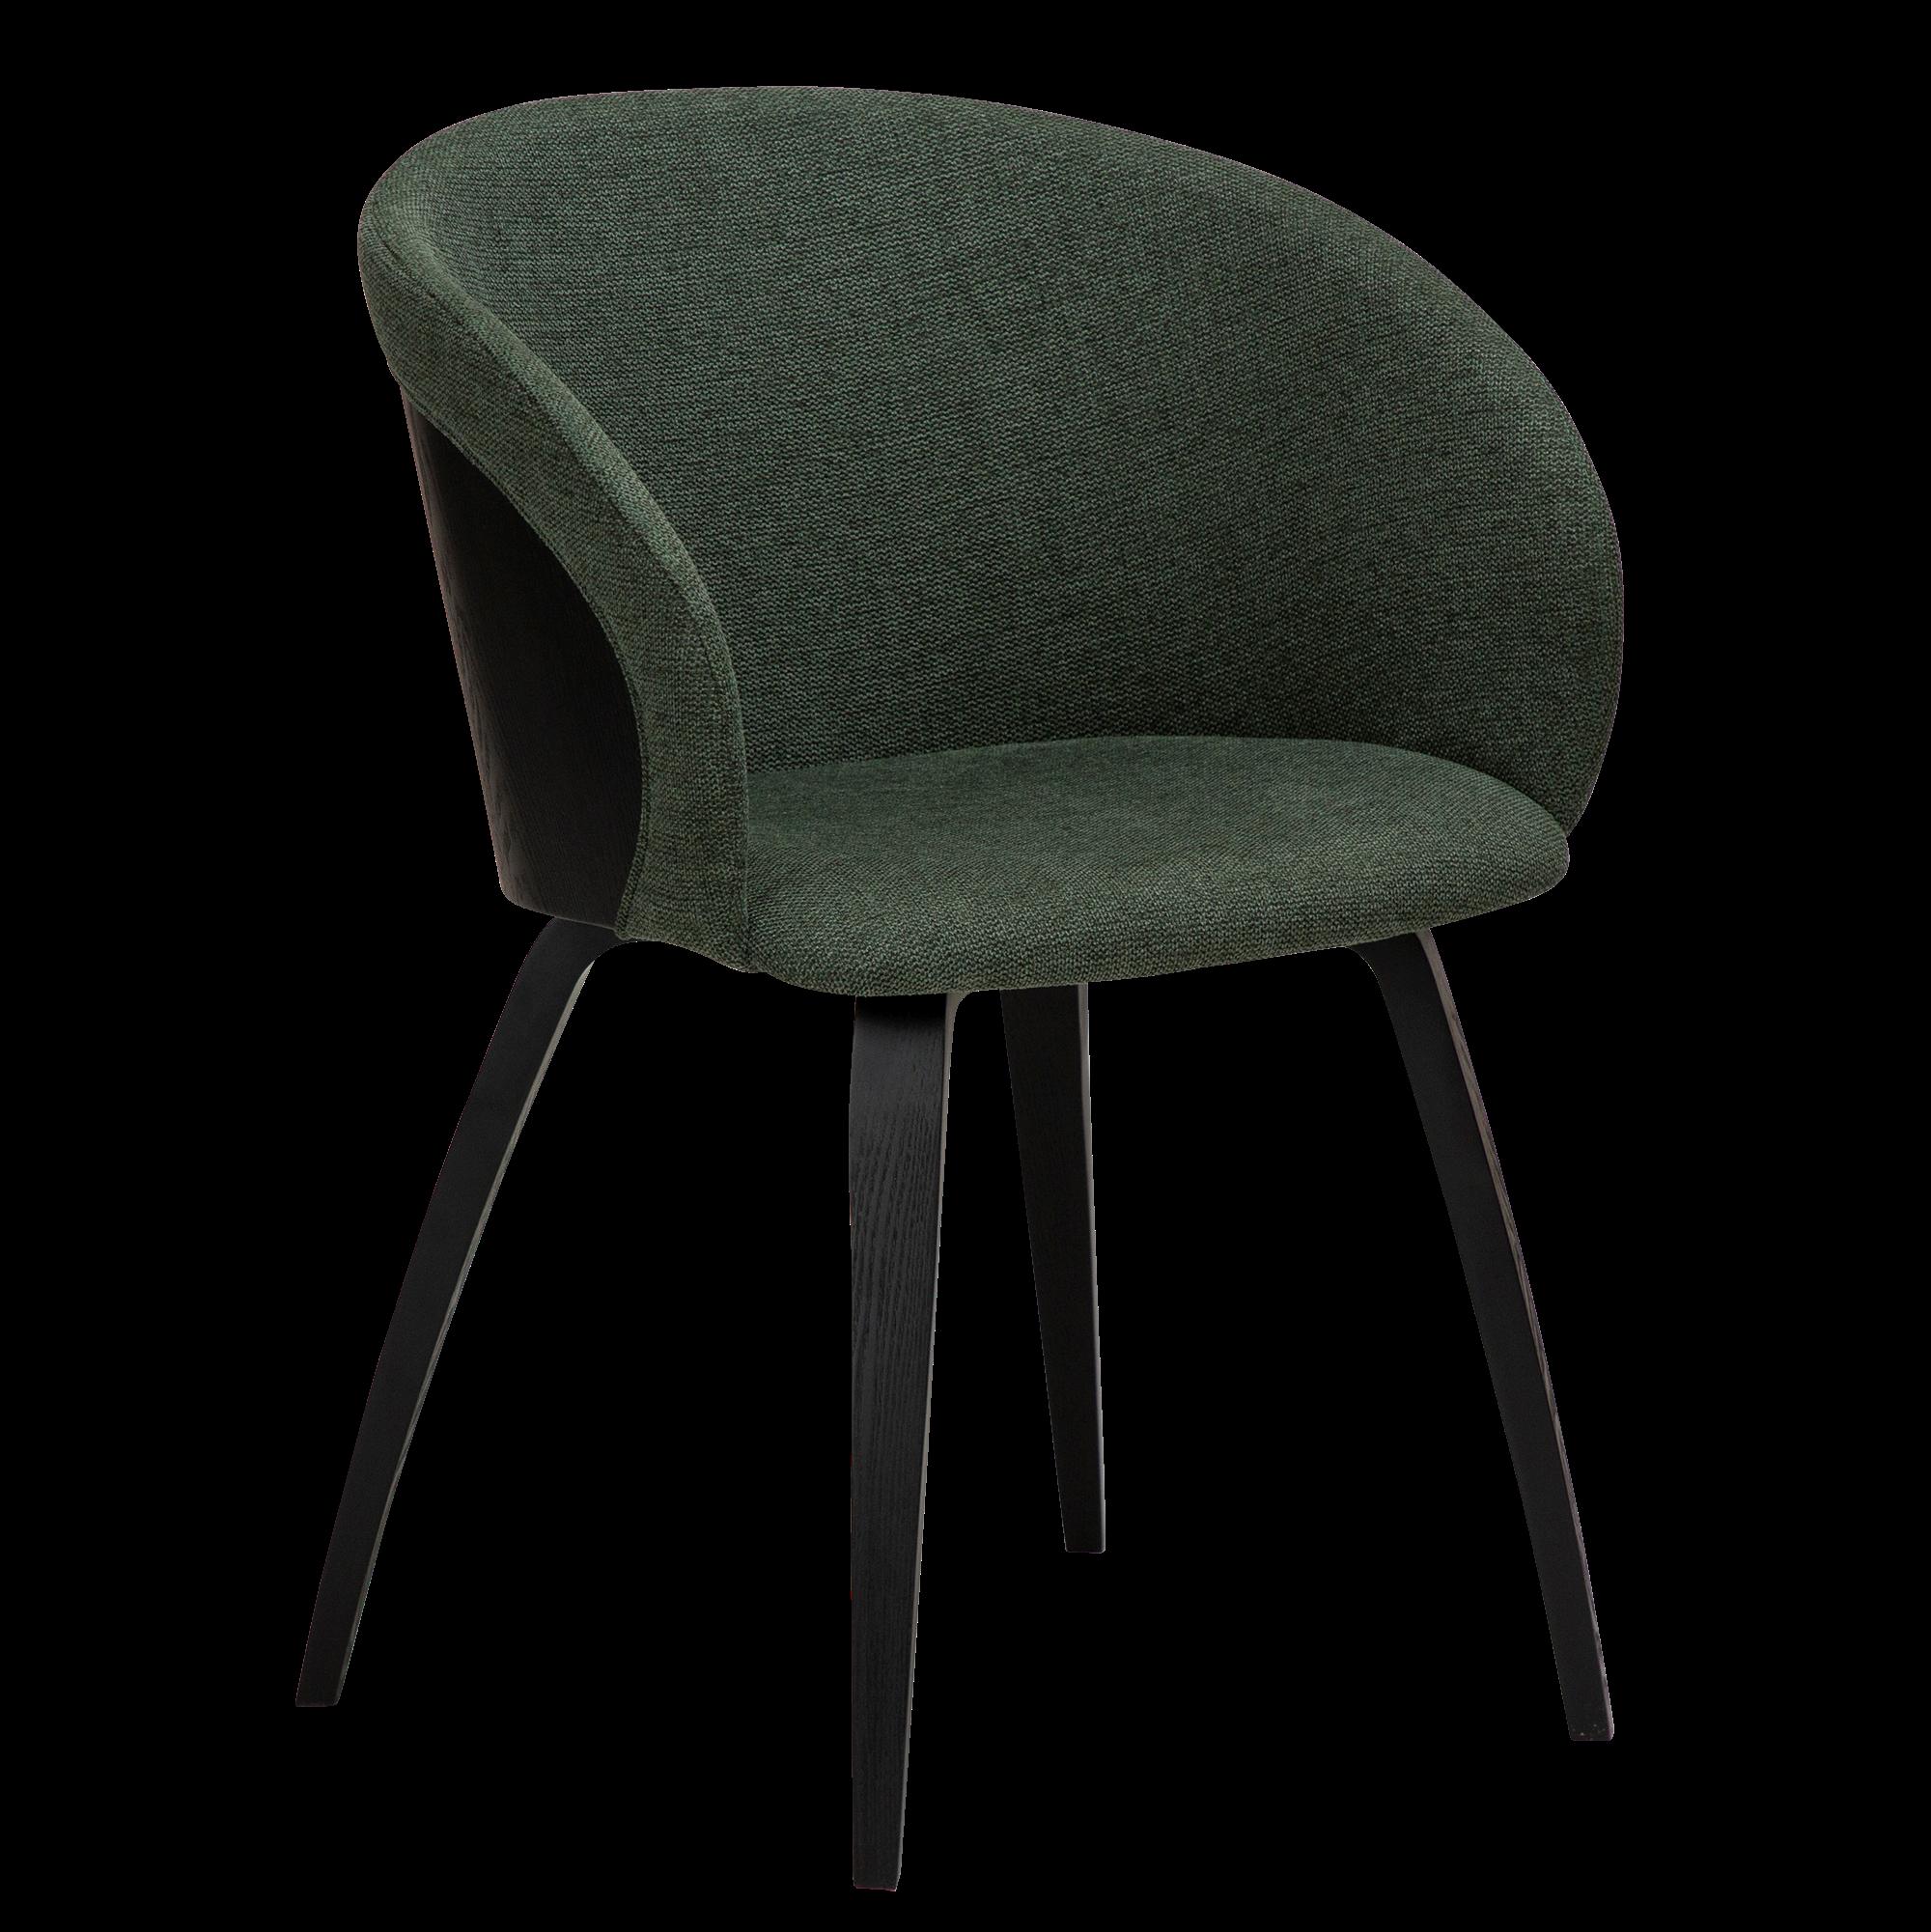 Køb Imo, Spisebordsstol, Stof by DAN-FORM Denmark (H: 80 cm. B: 57 cm. L: 51 cm., Grøn)